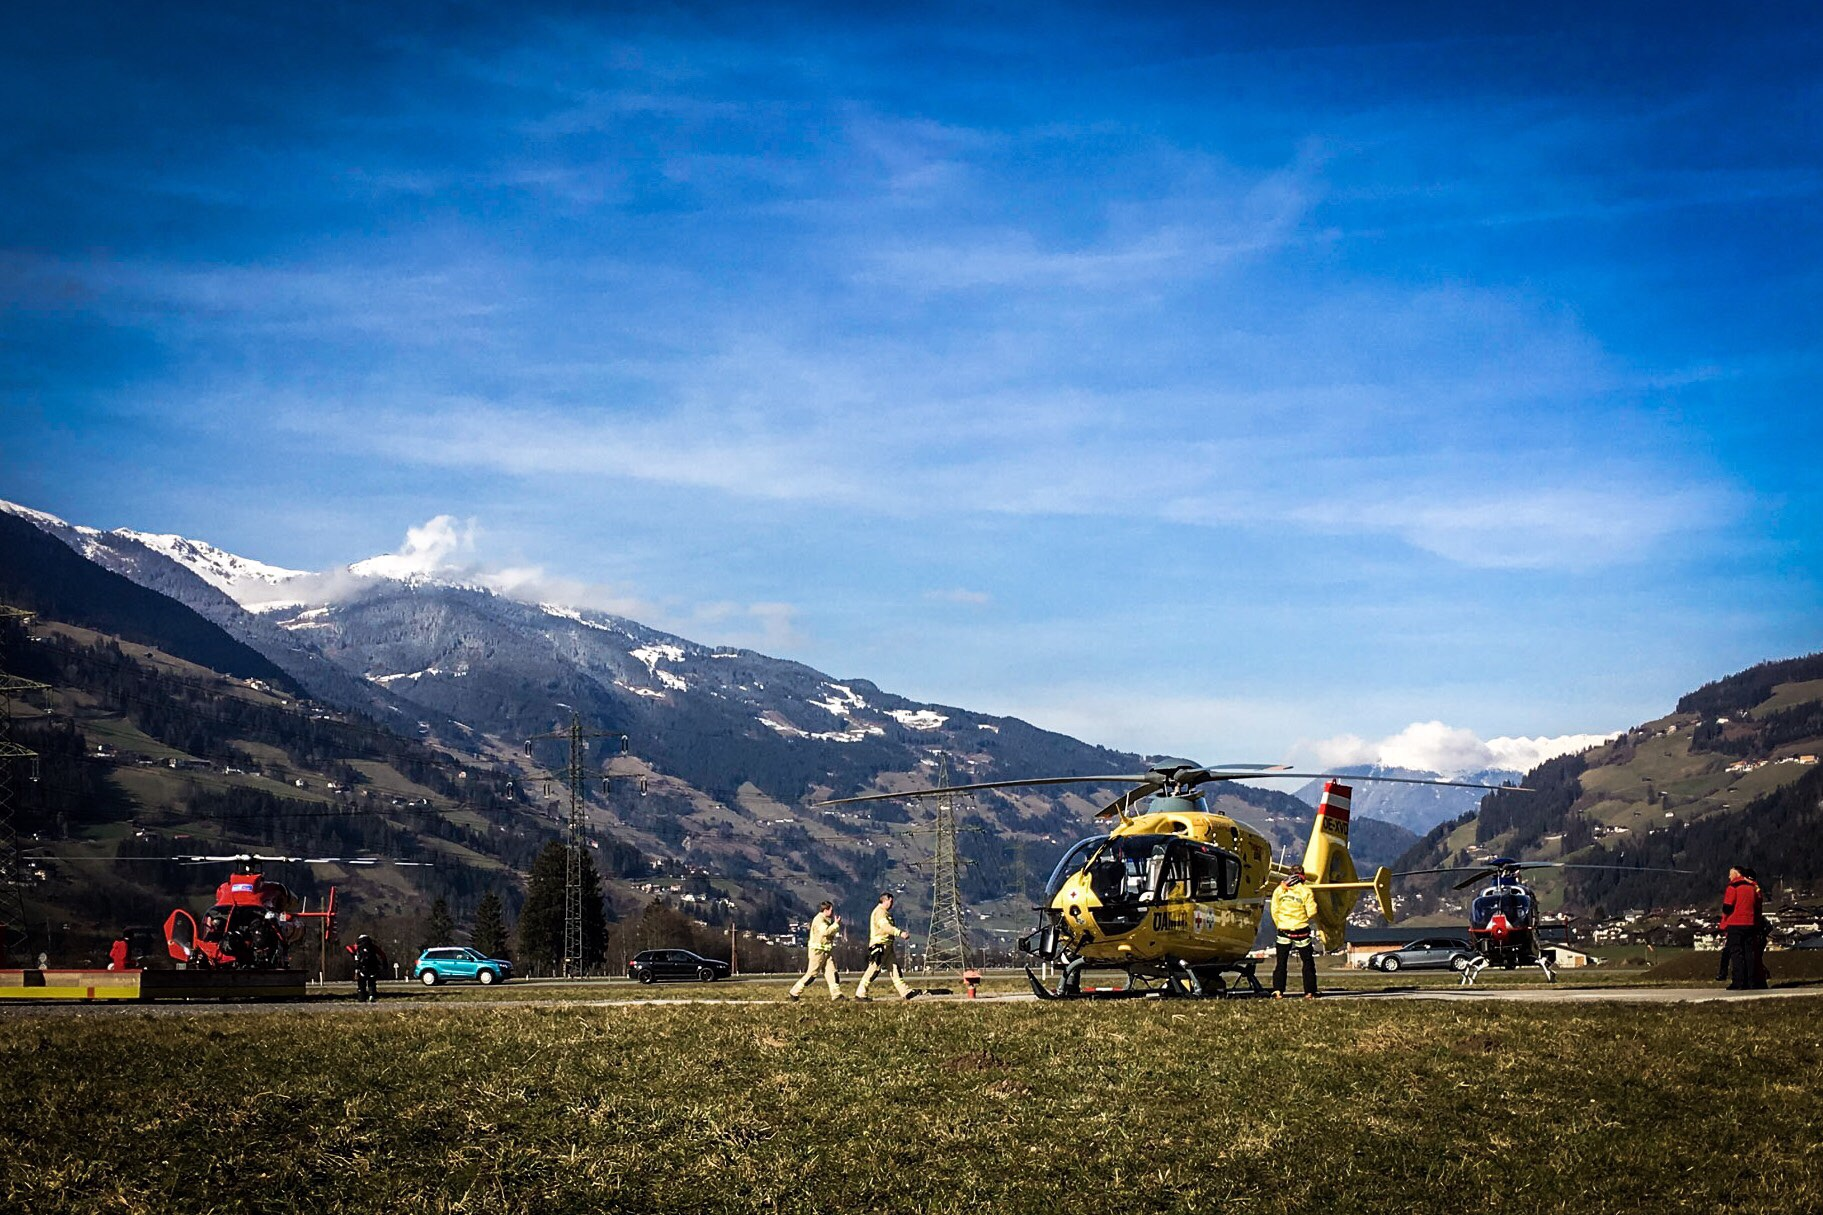 Landingplatz Mayrhofen